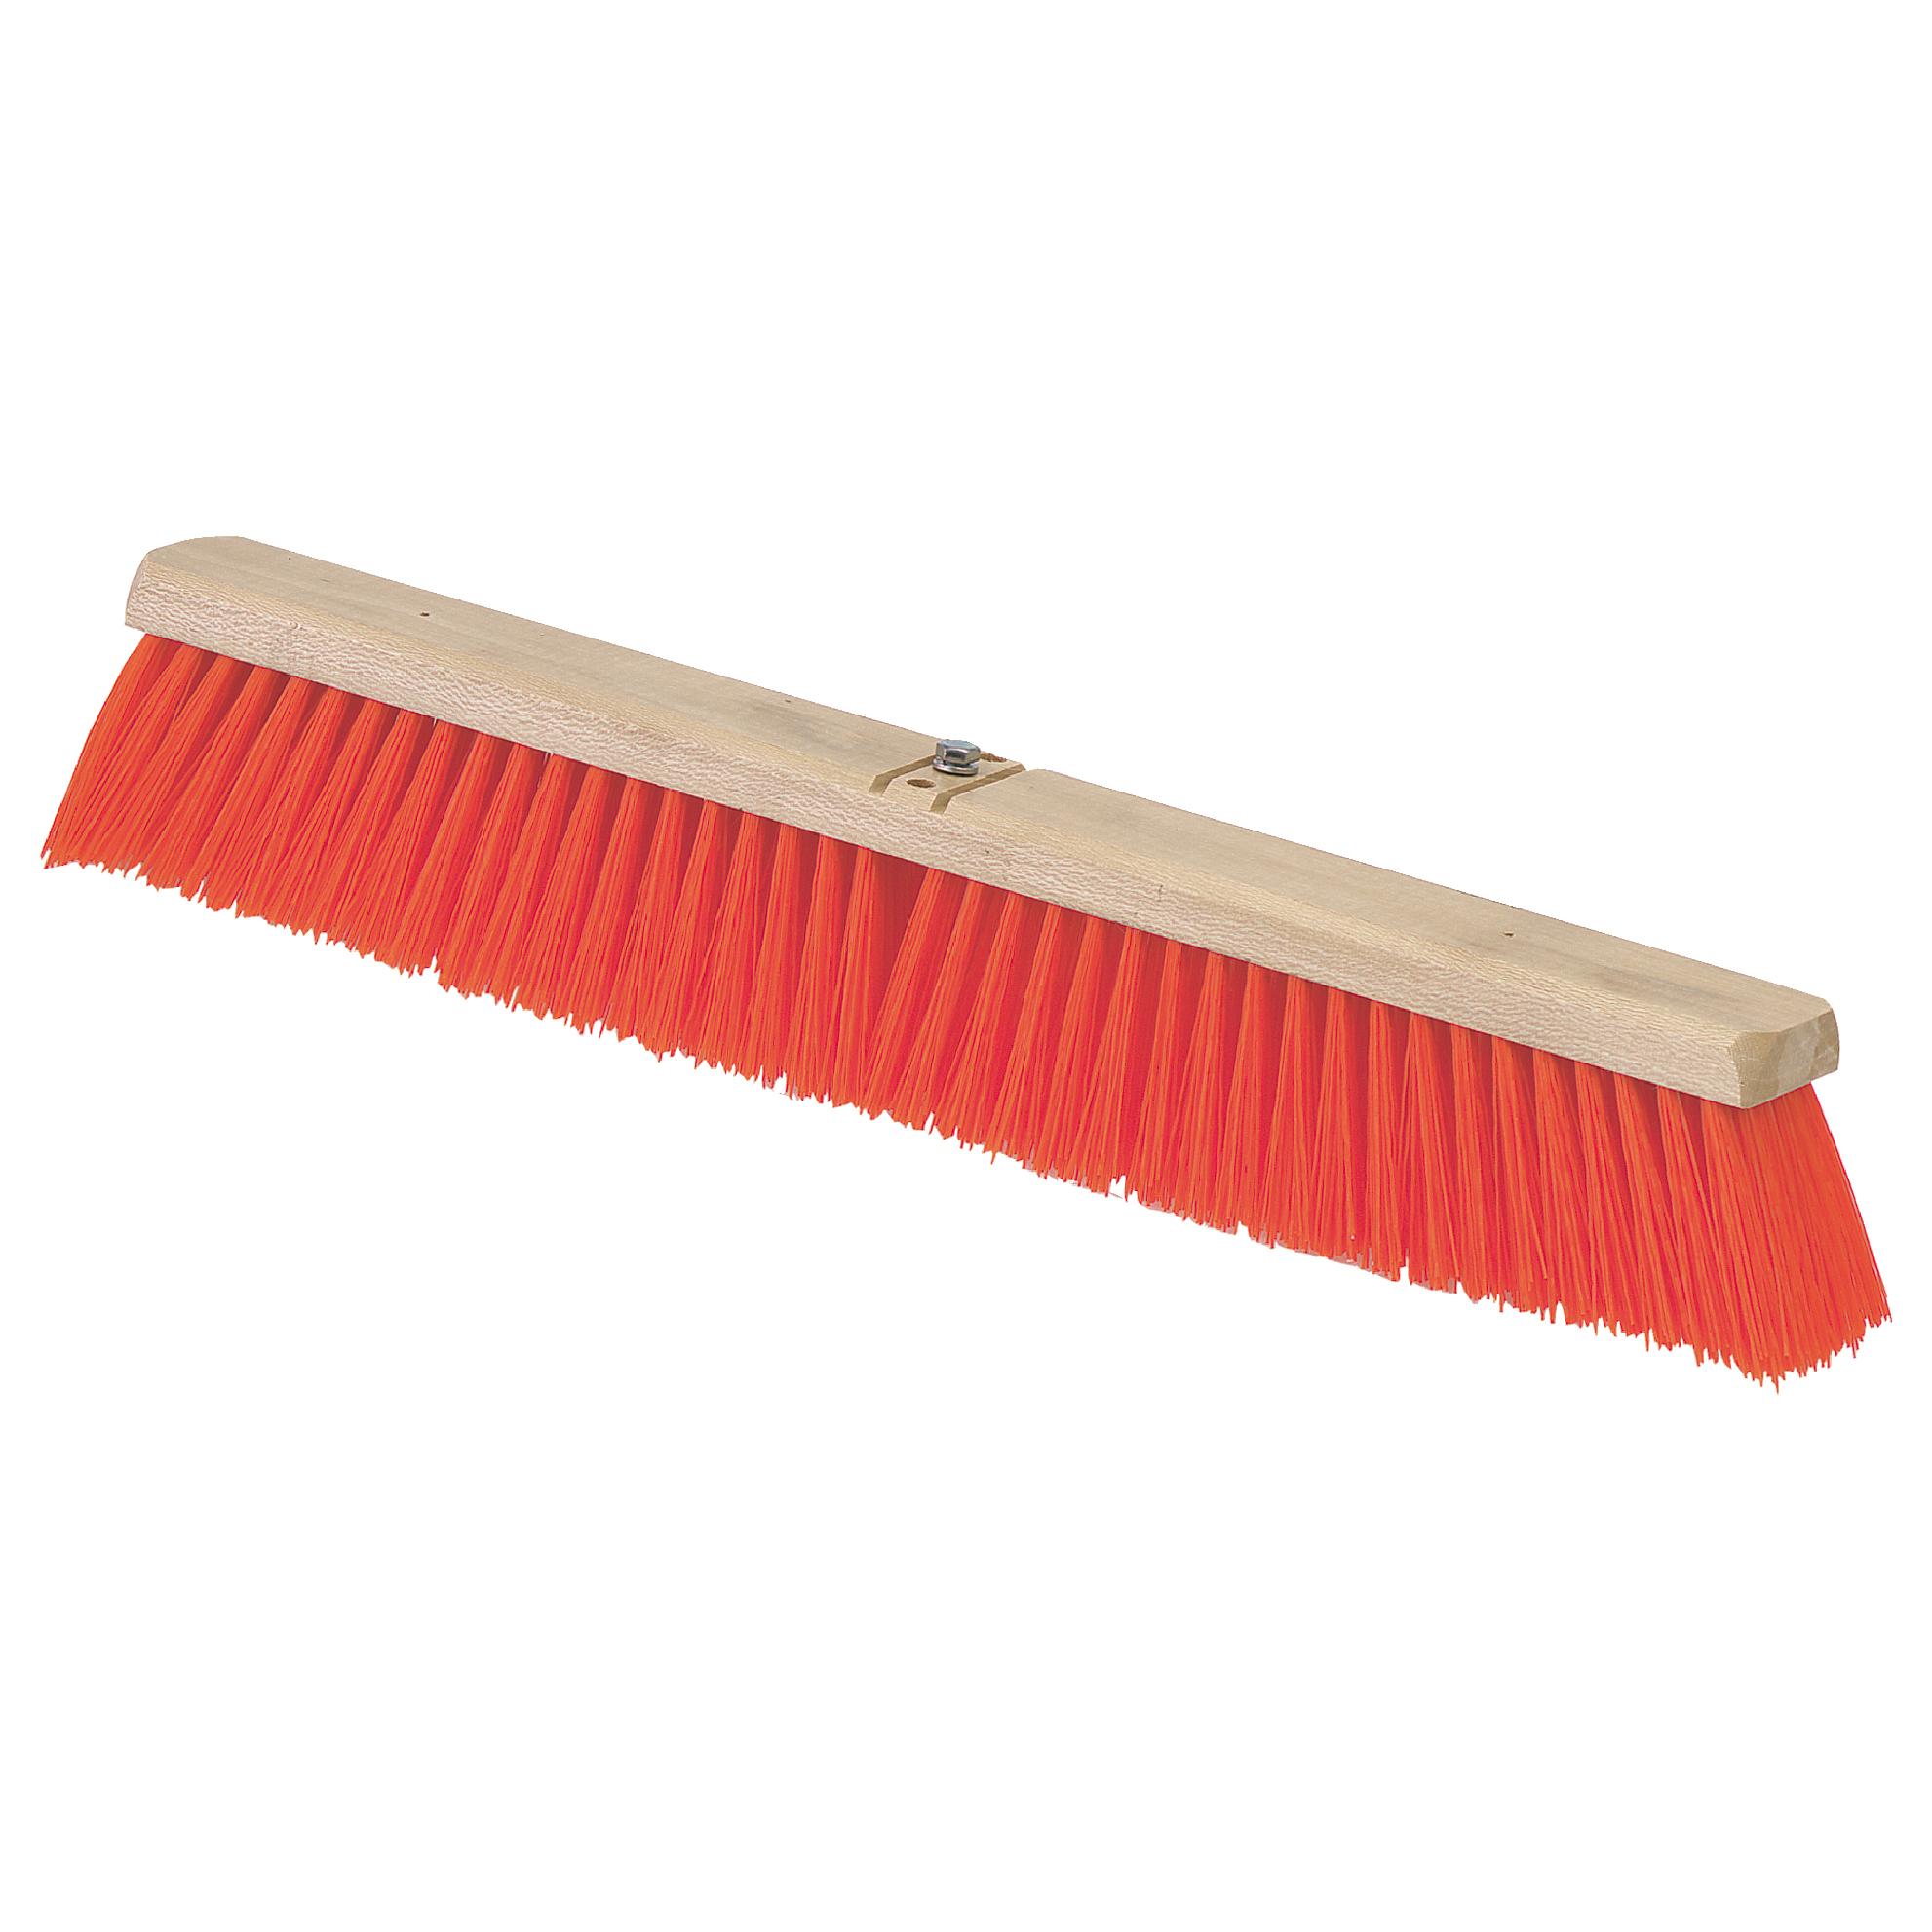 Carlisle 3610762424 broom head, push